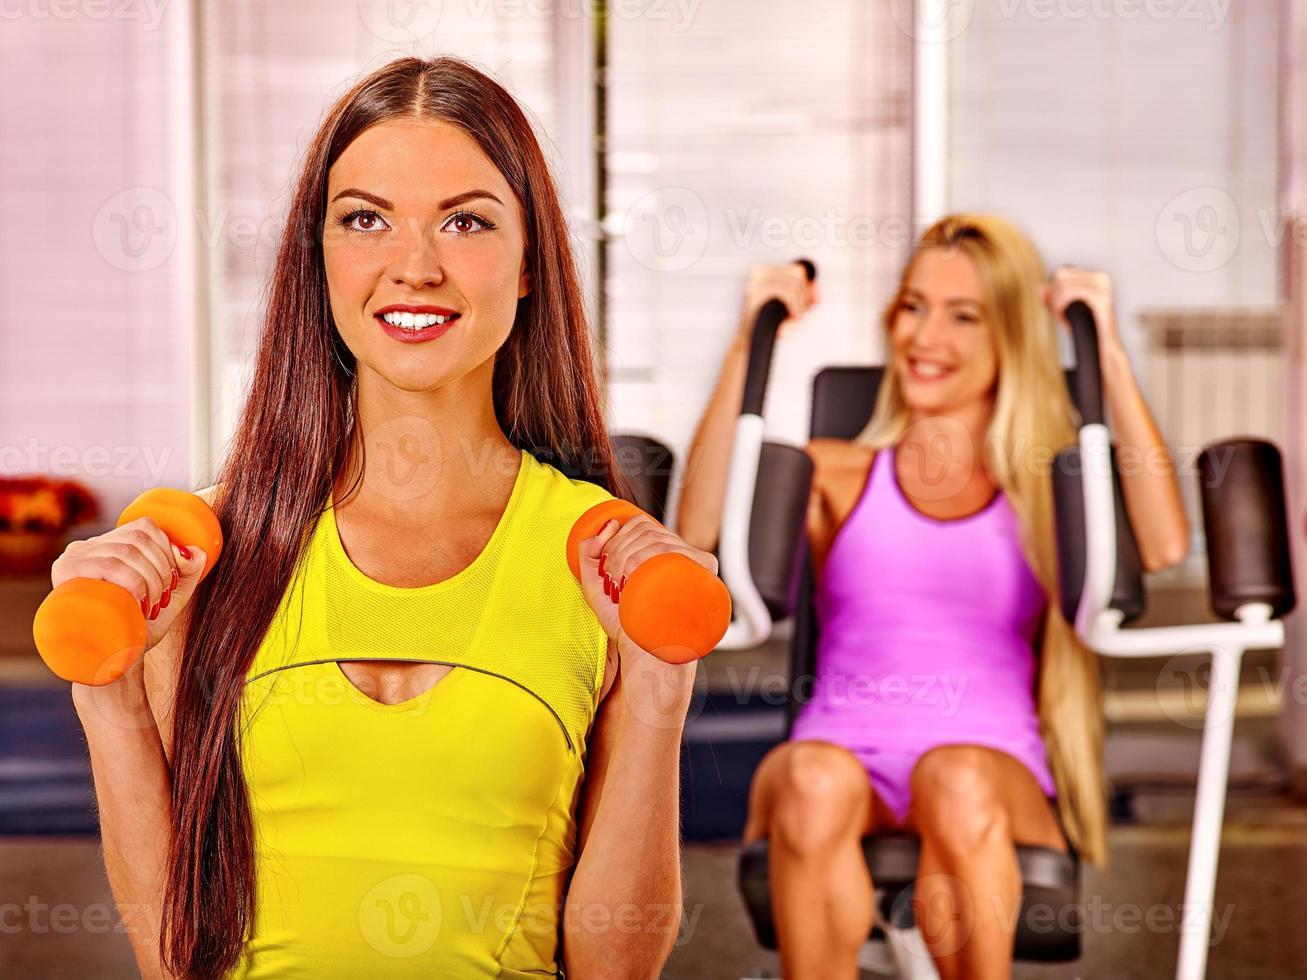 Girls holding dumbbells in sport gym photo